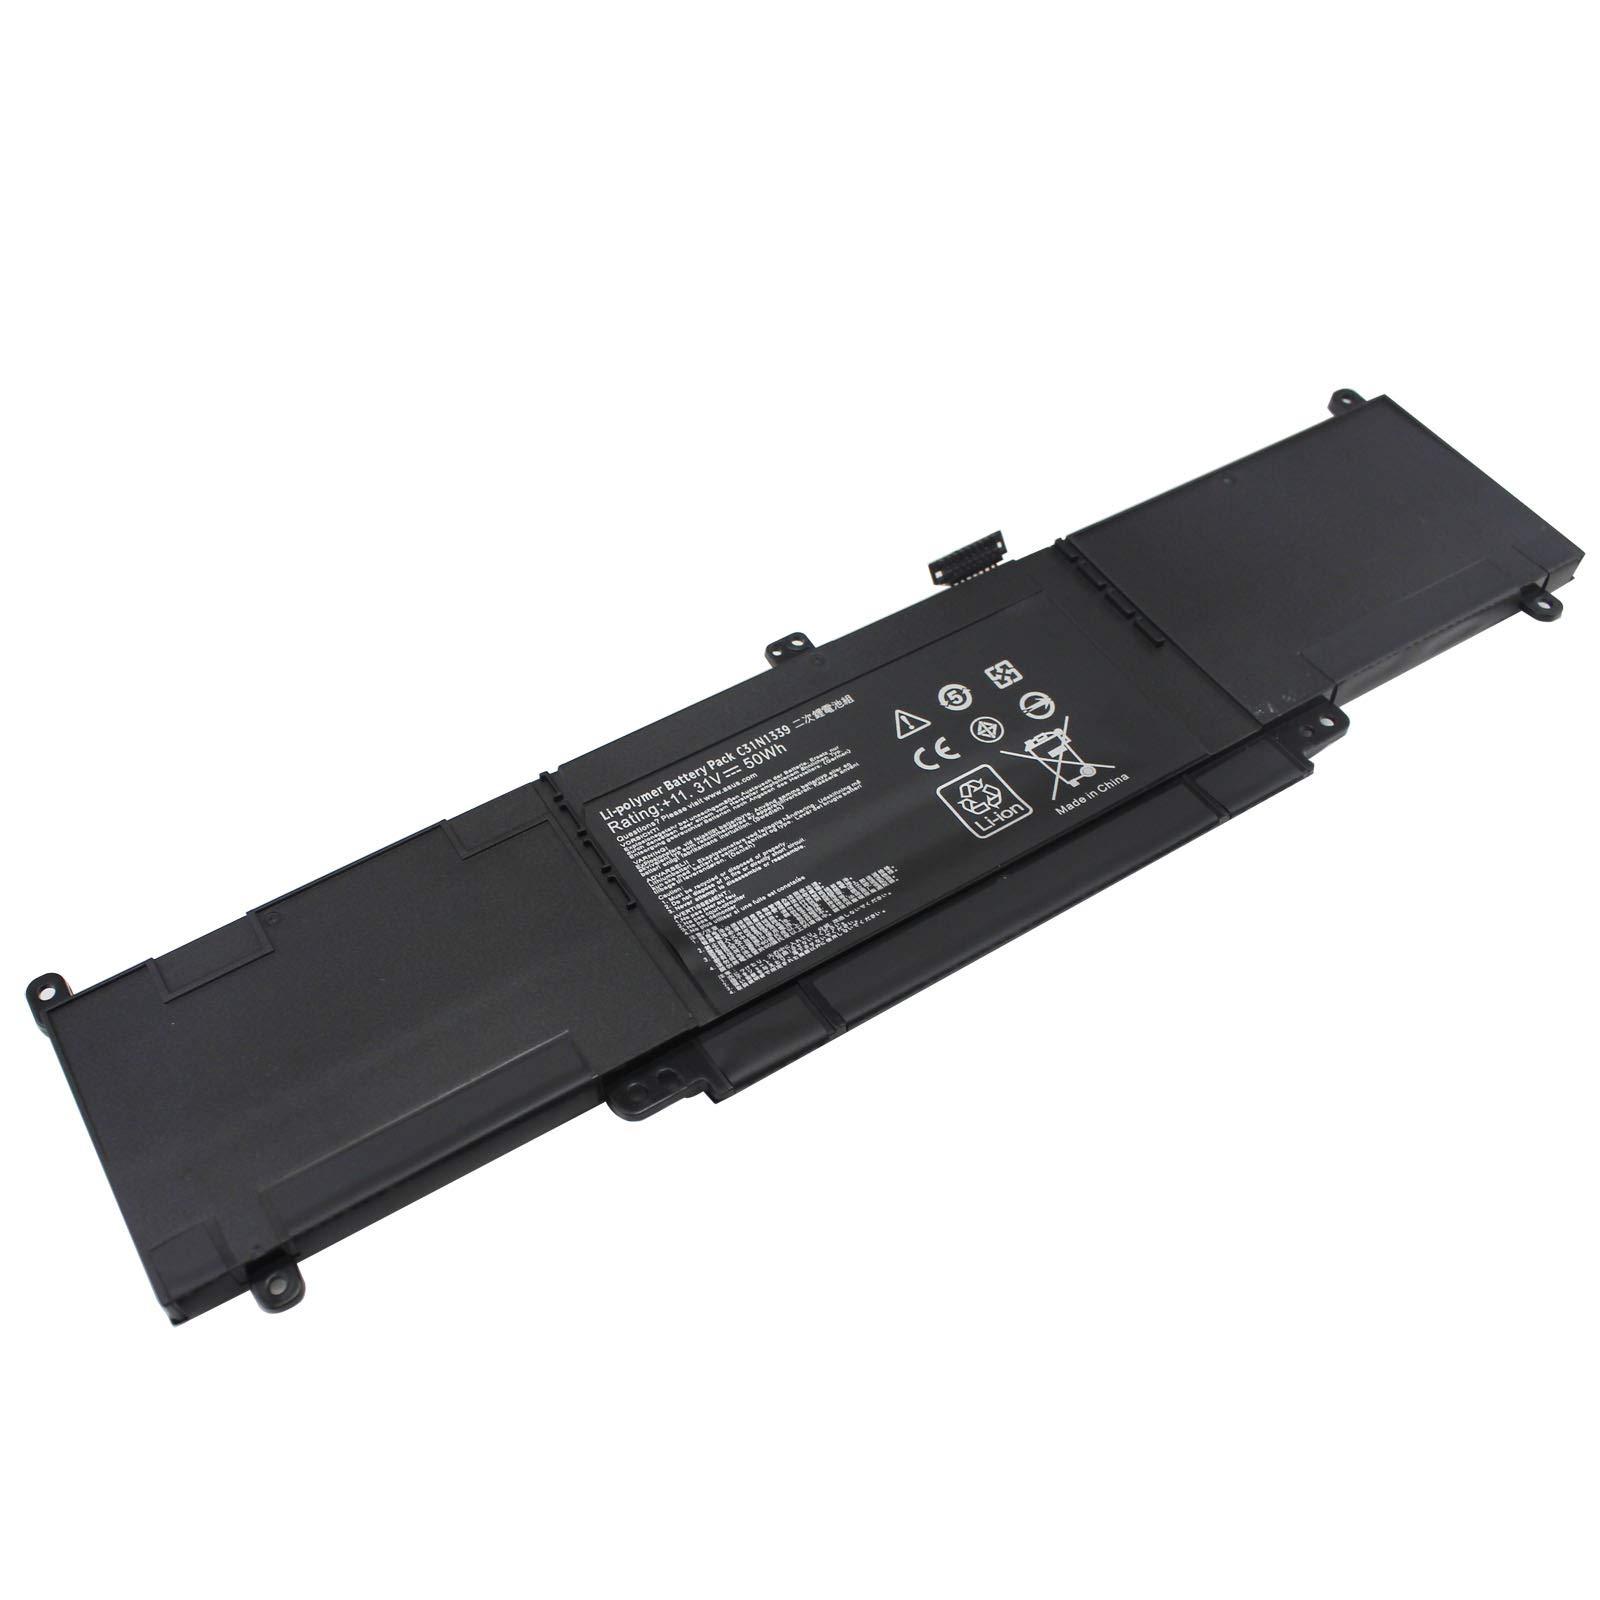 Bateria 50WH C31N1339 ASUS ZenBook UX303 UX303L UX303LA UX30